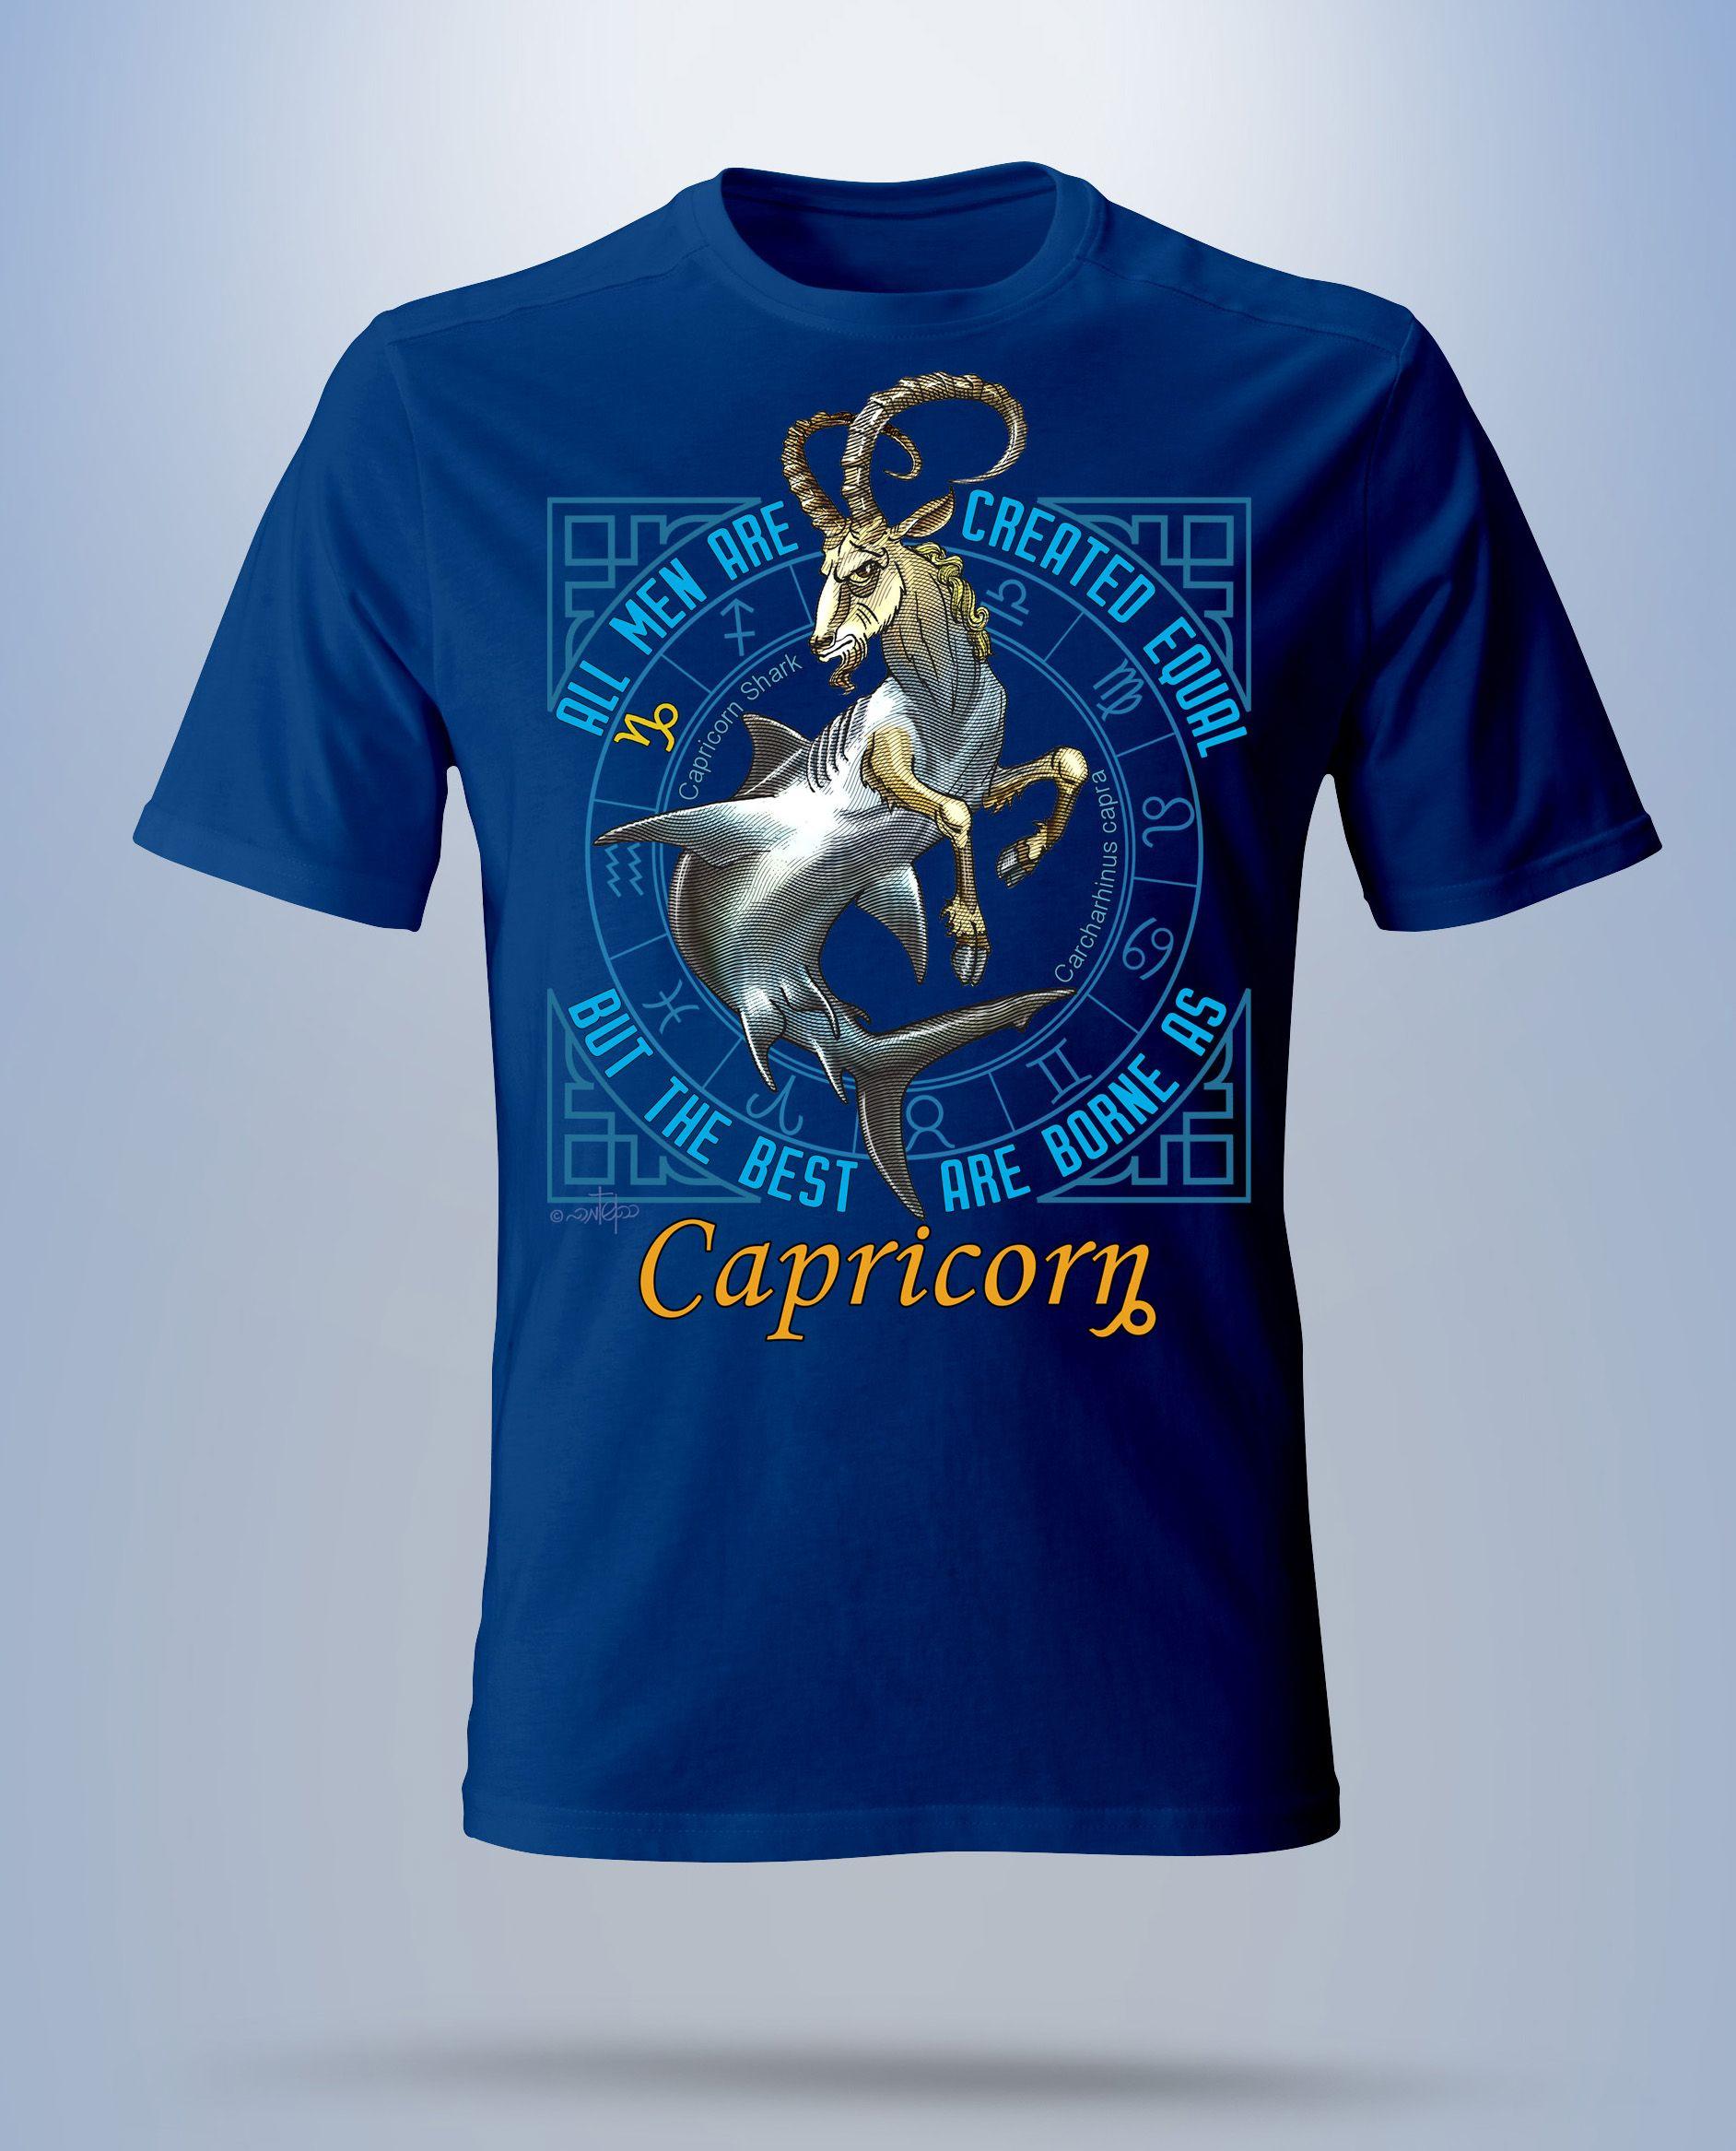 8c967b69 A unique design of Capricorn sign T shirt | Capricorn T Shirts ...